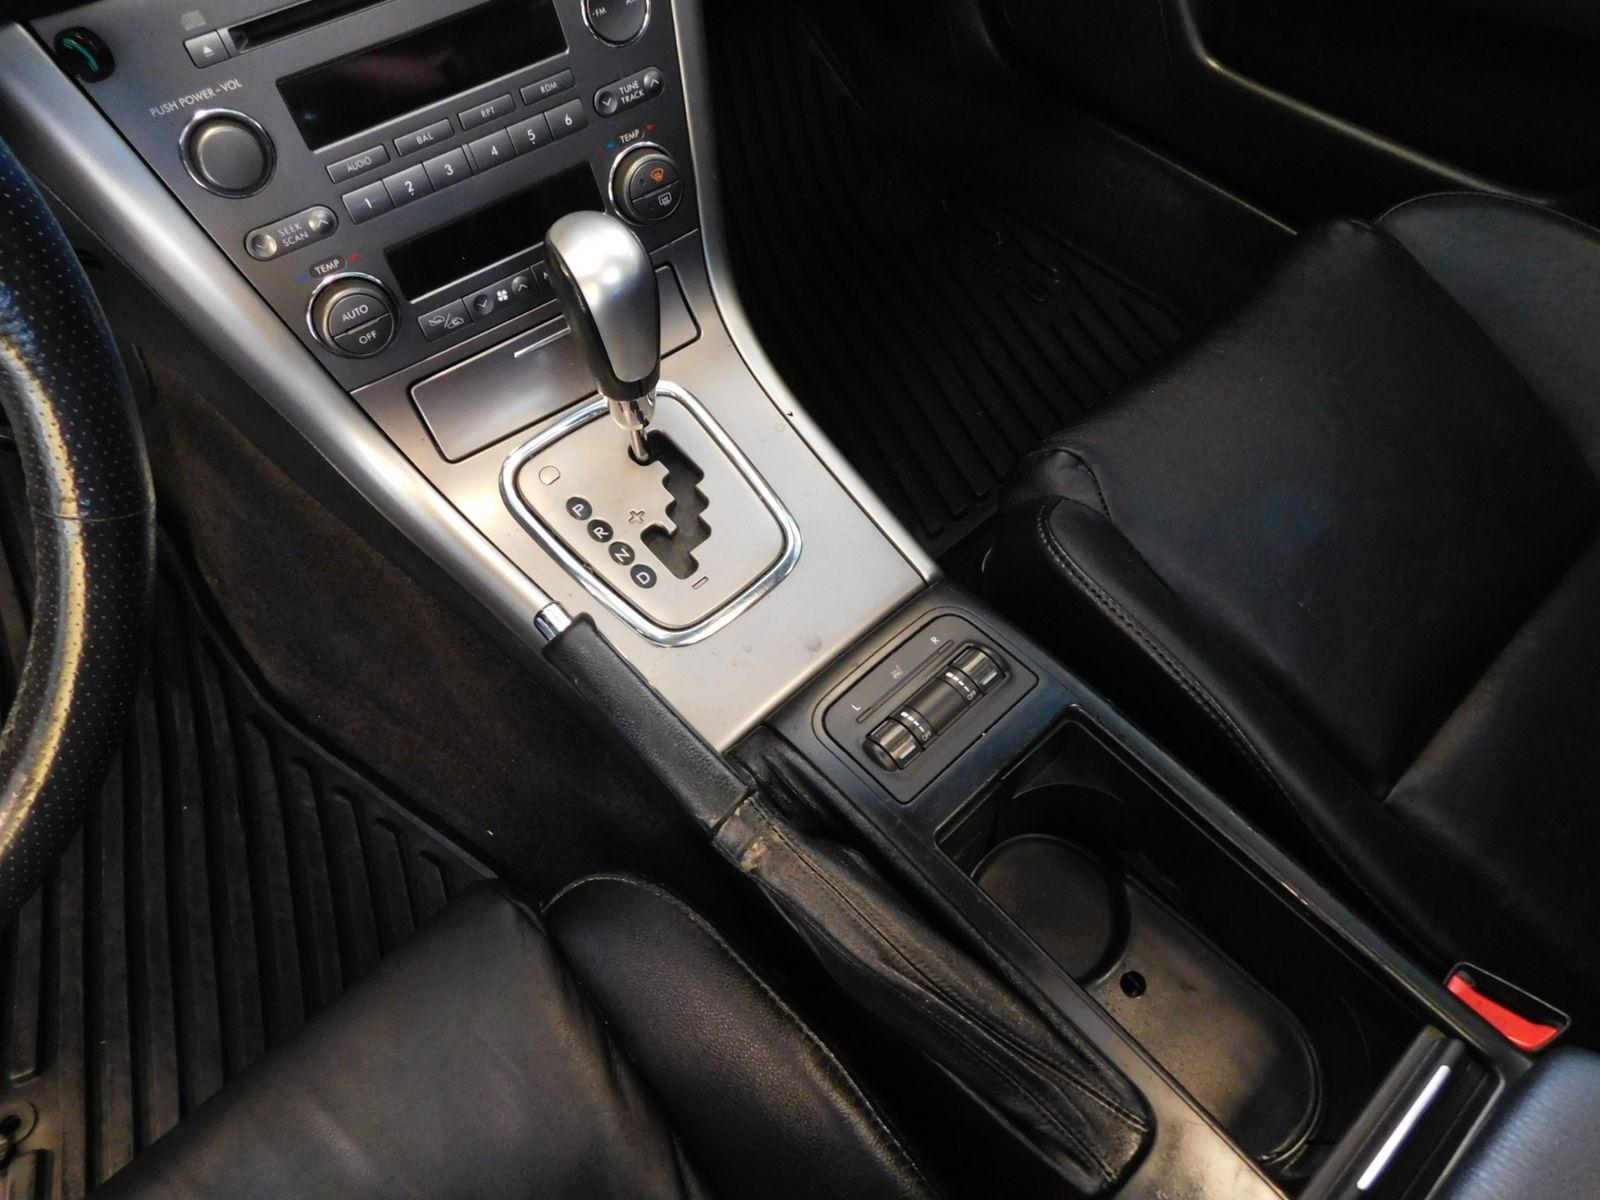 2005 Subaru Outback Ltd New Timing Belt Head Gaskets City Tn Doug Seat Wiring Justus Auto